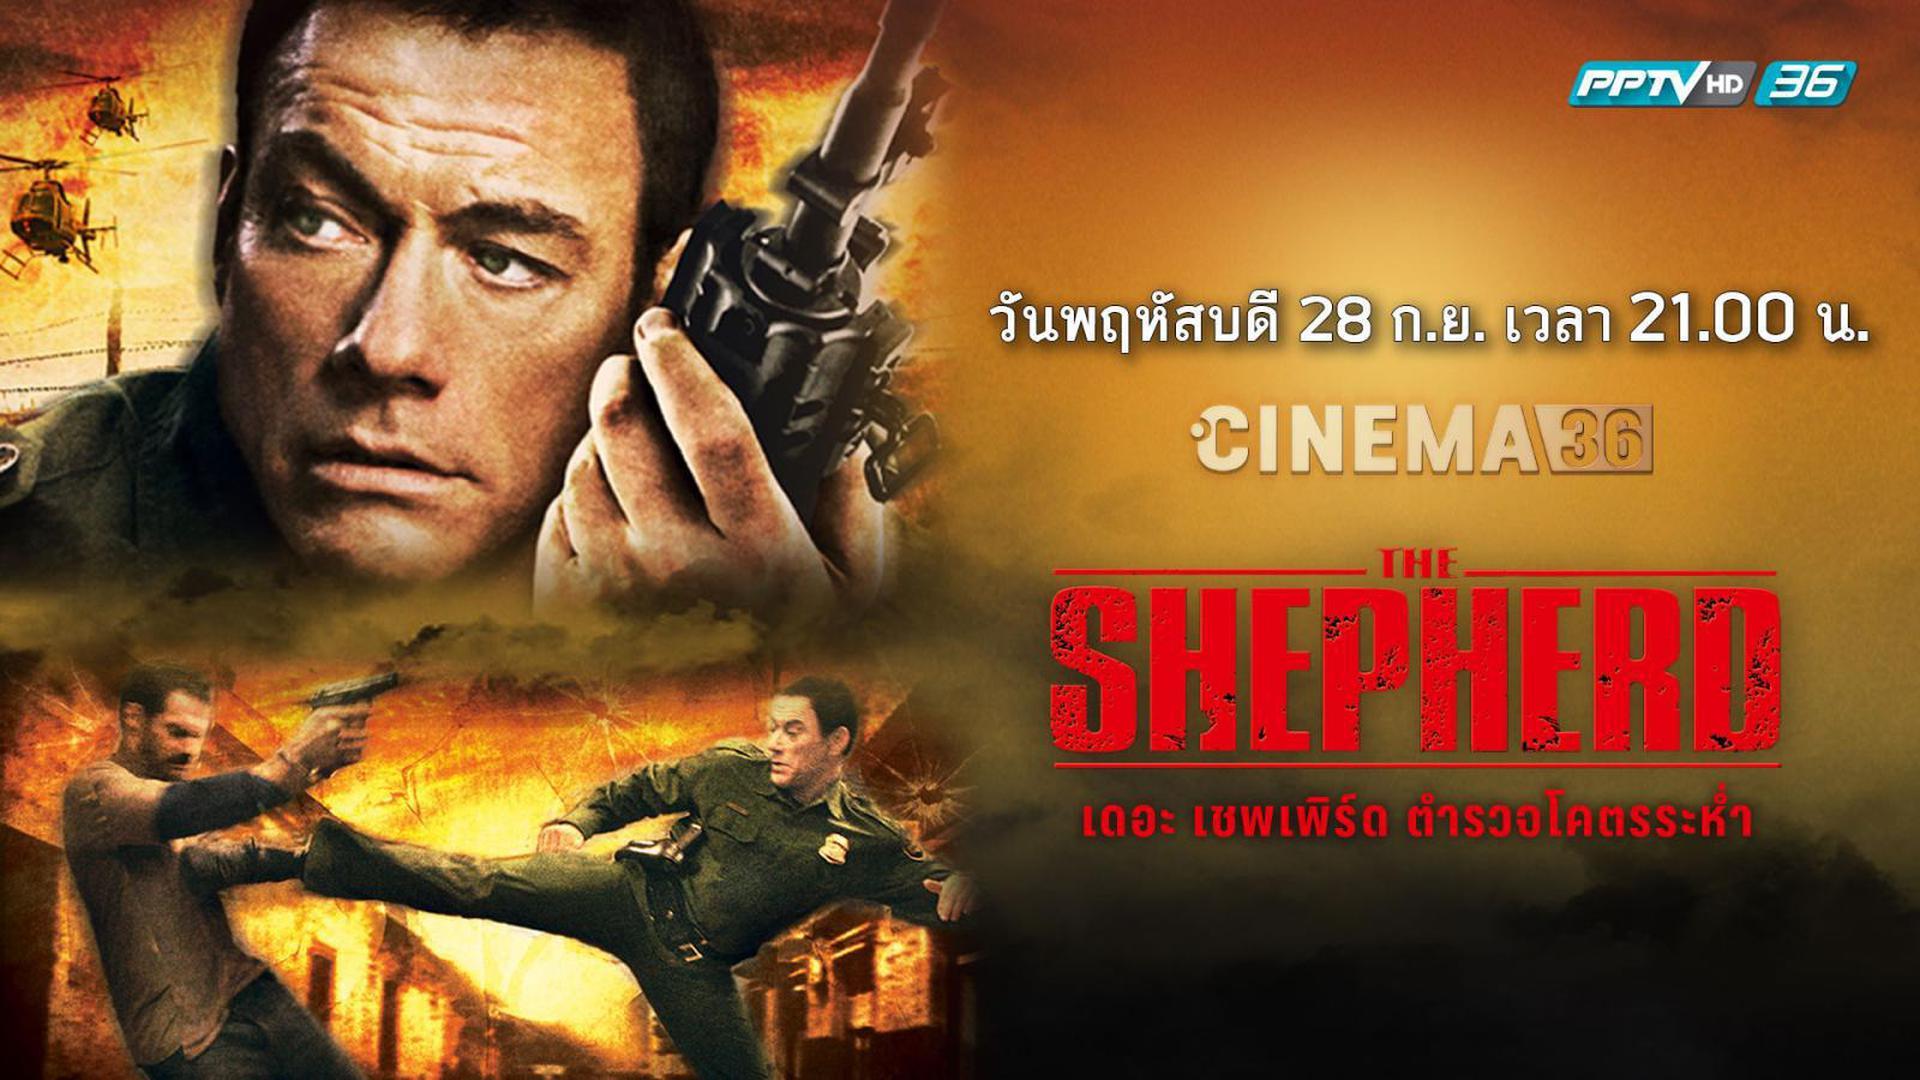 THE SHEPHERD (2008) เดอะ เชพเพิร์ด ตำรวจโคตรระห่ำ